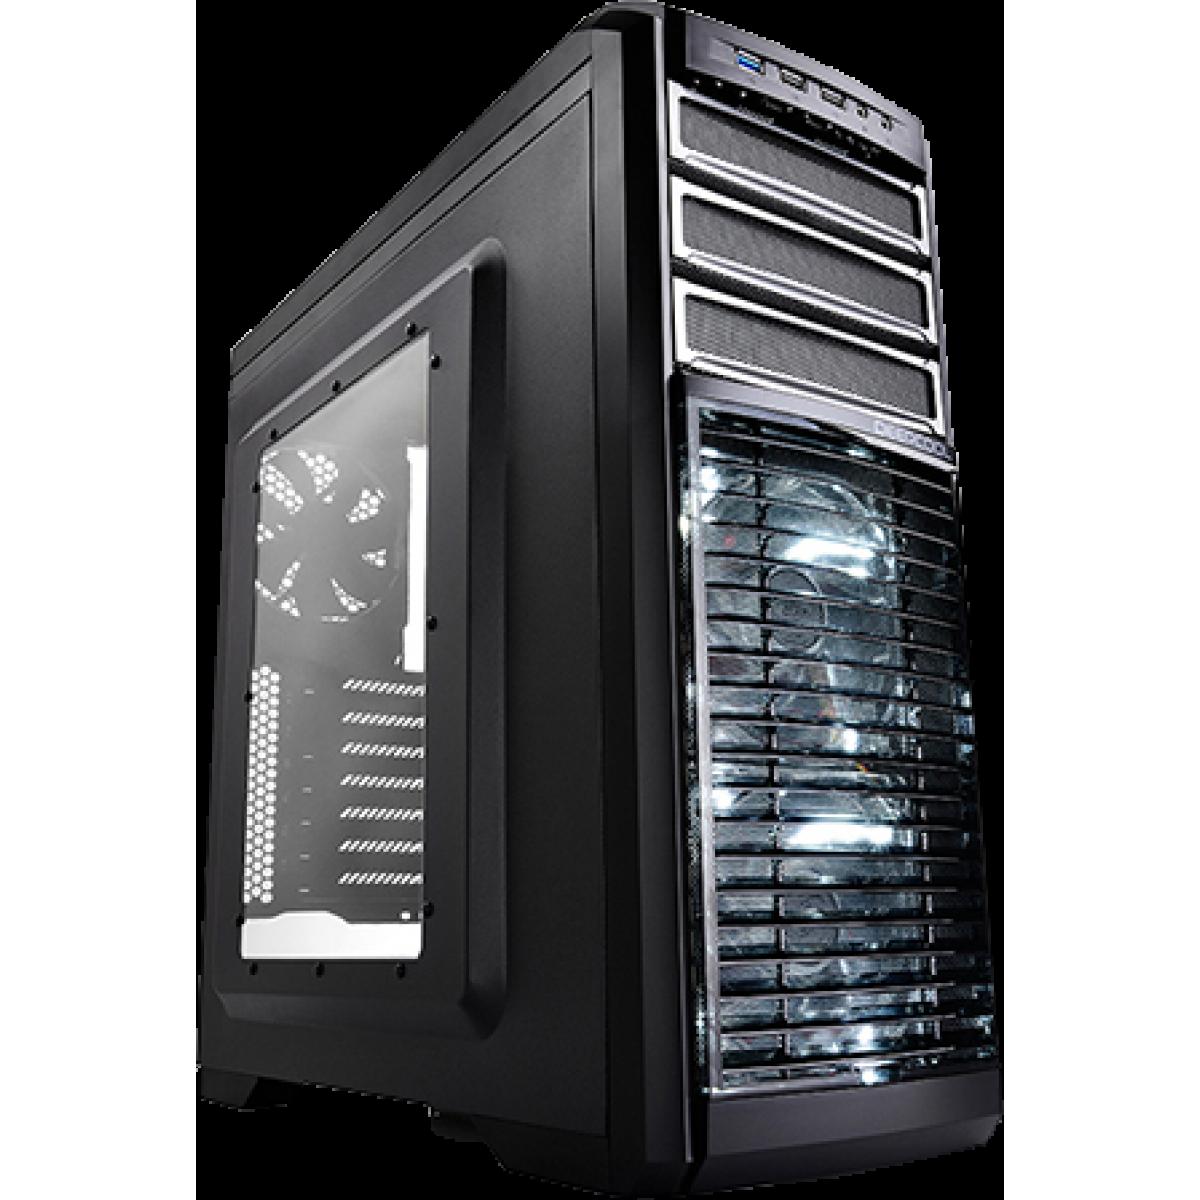 Gabinete Gamer DeepCool Kendomen Titanium, Mid-Tower, Com 5 Fans, Black, Sem Fonte, DP-CCATX-KDM5FBKTI